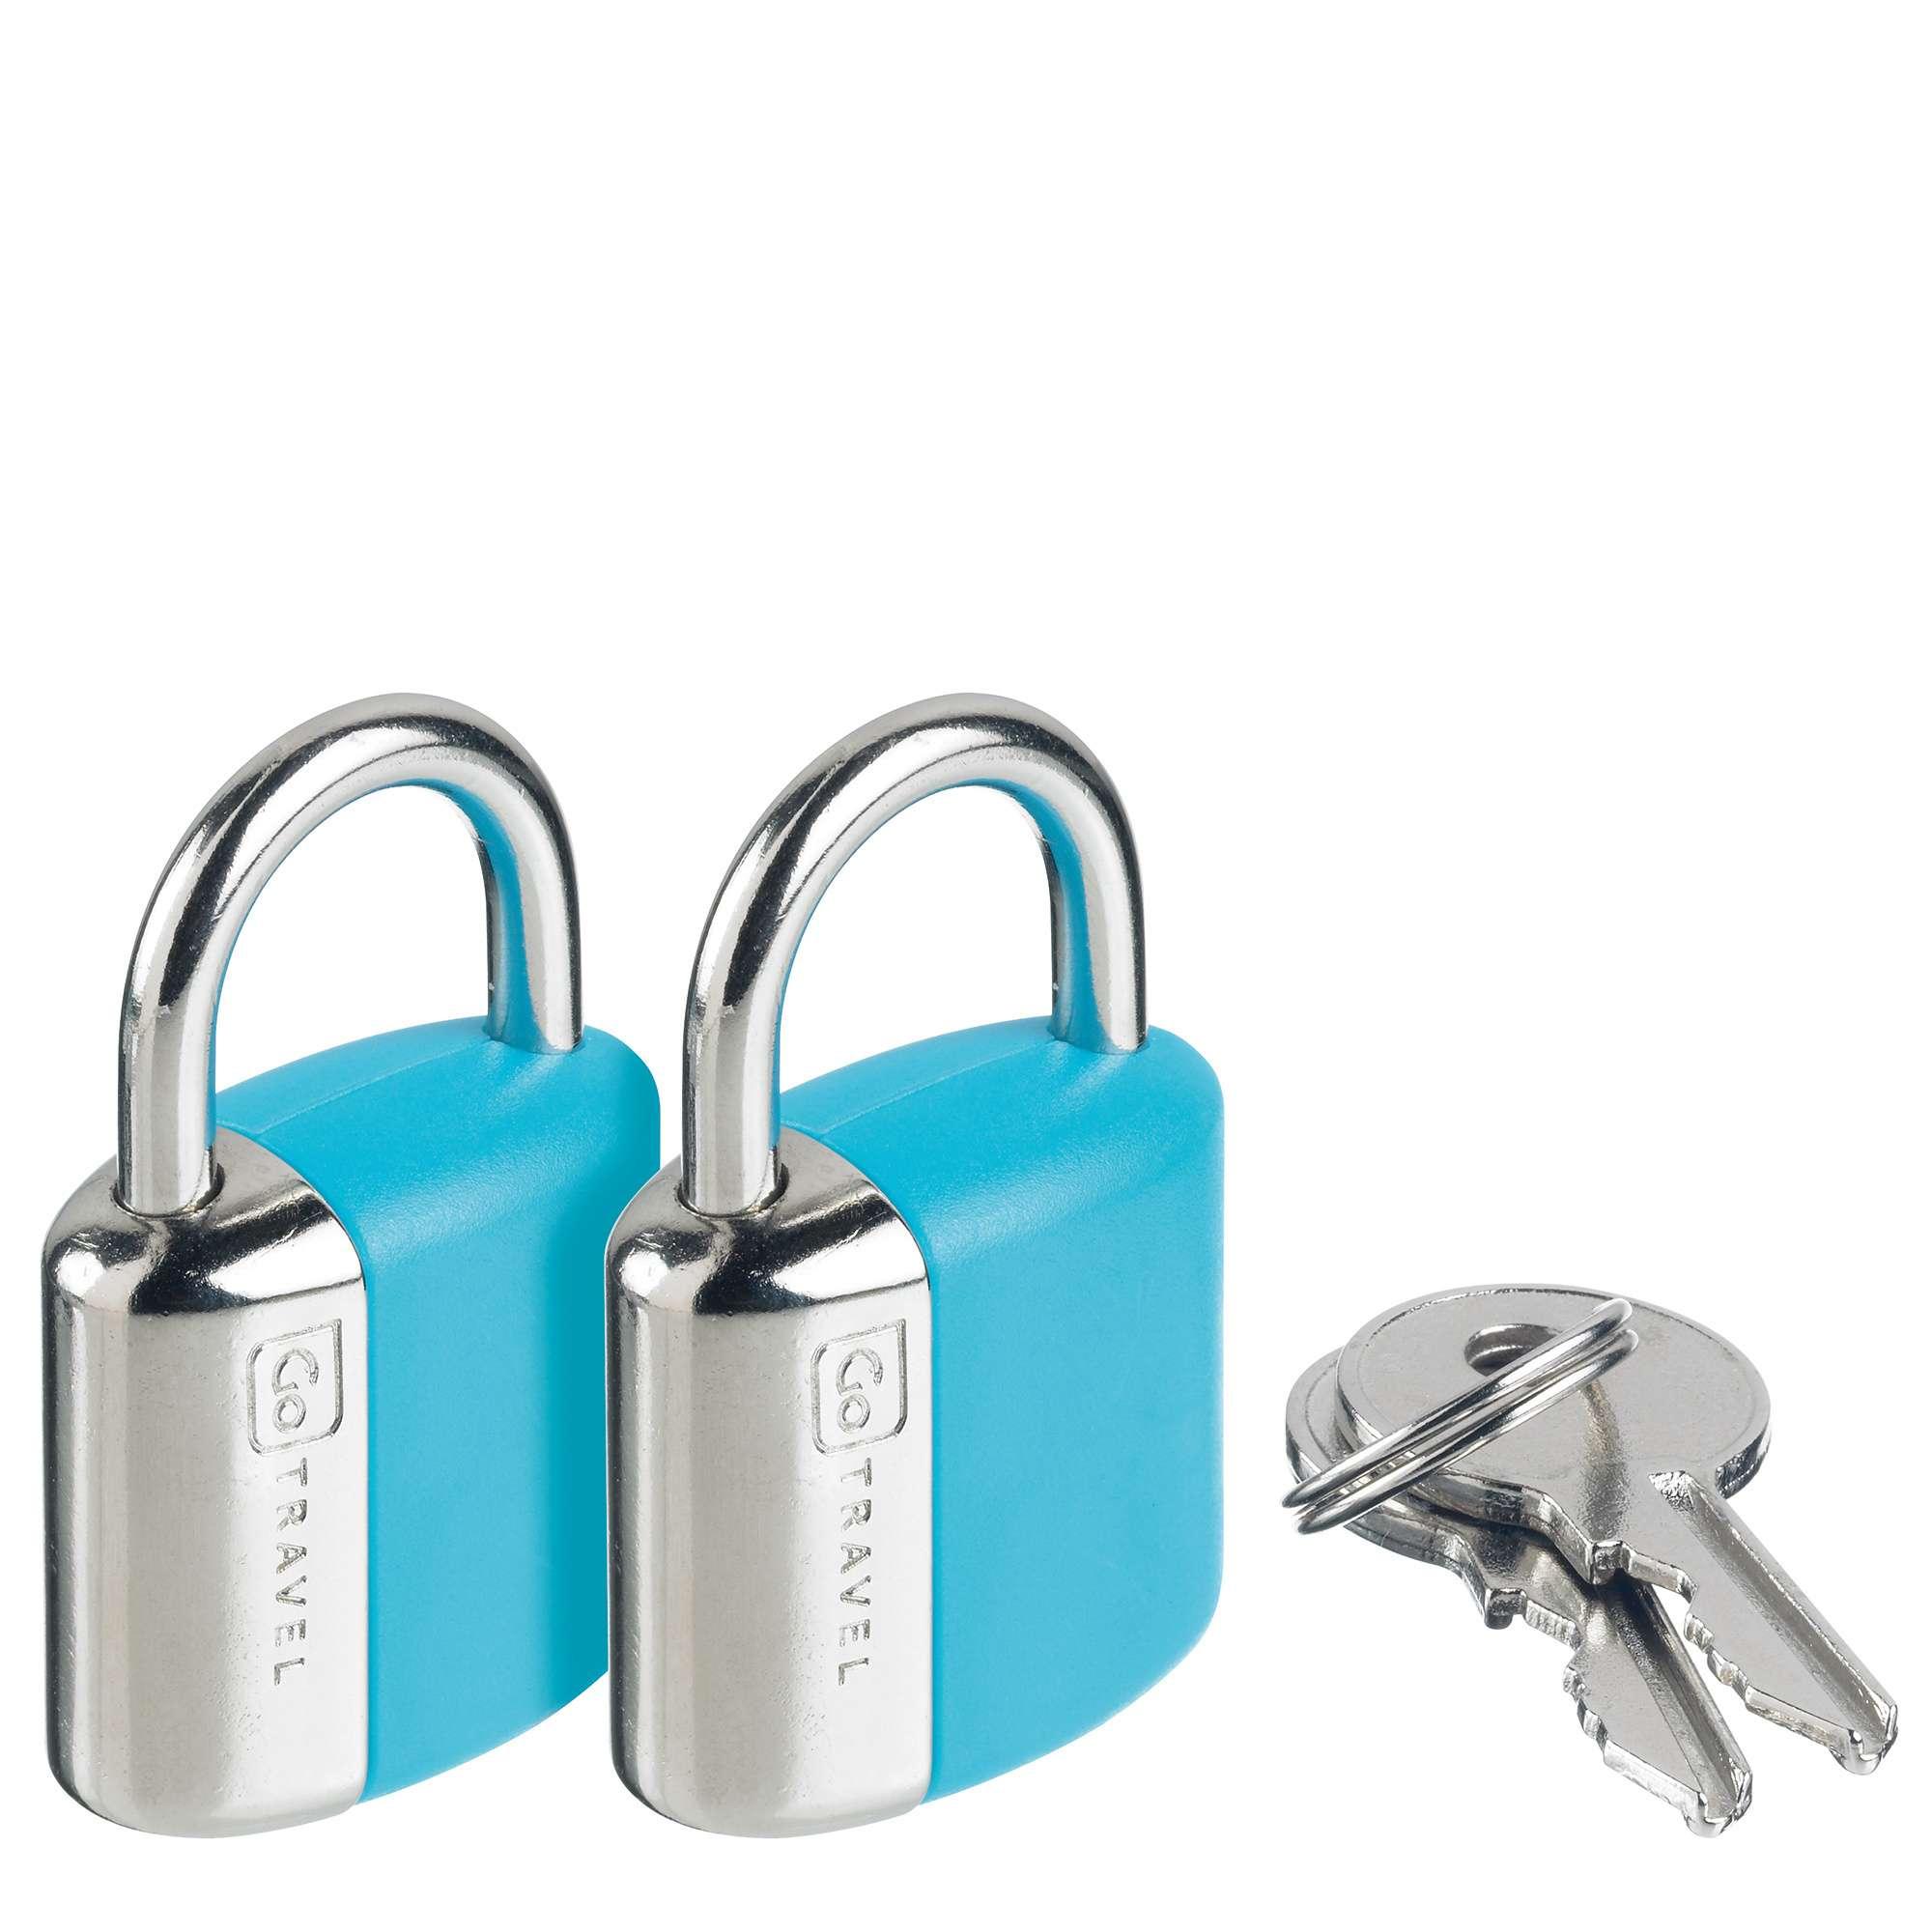 DESIGN GO Glo Key Locks